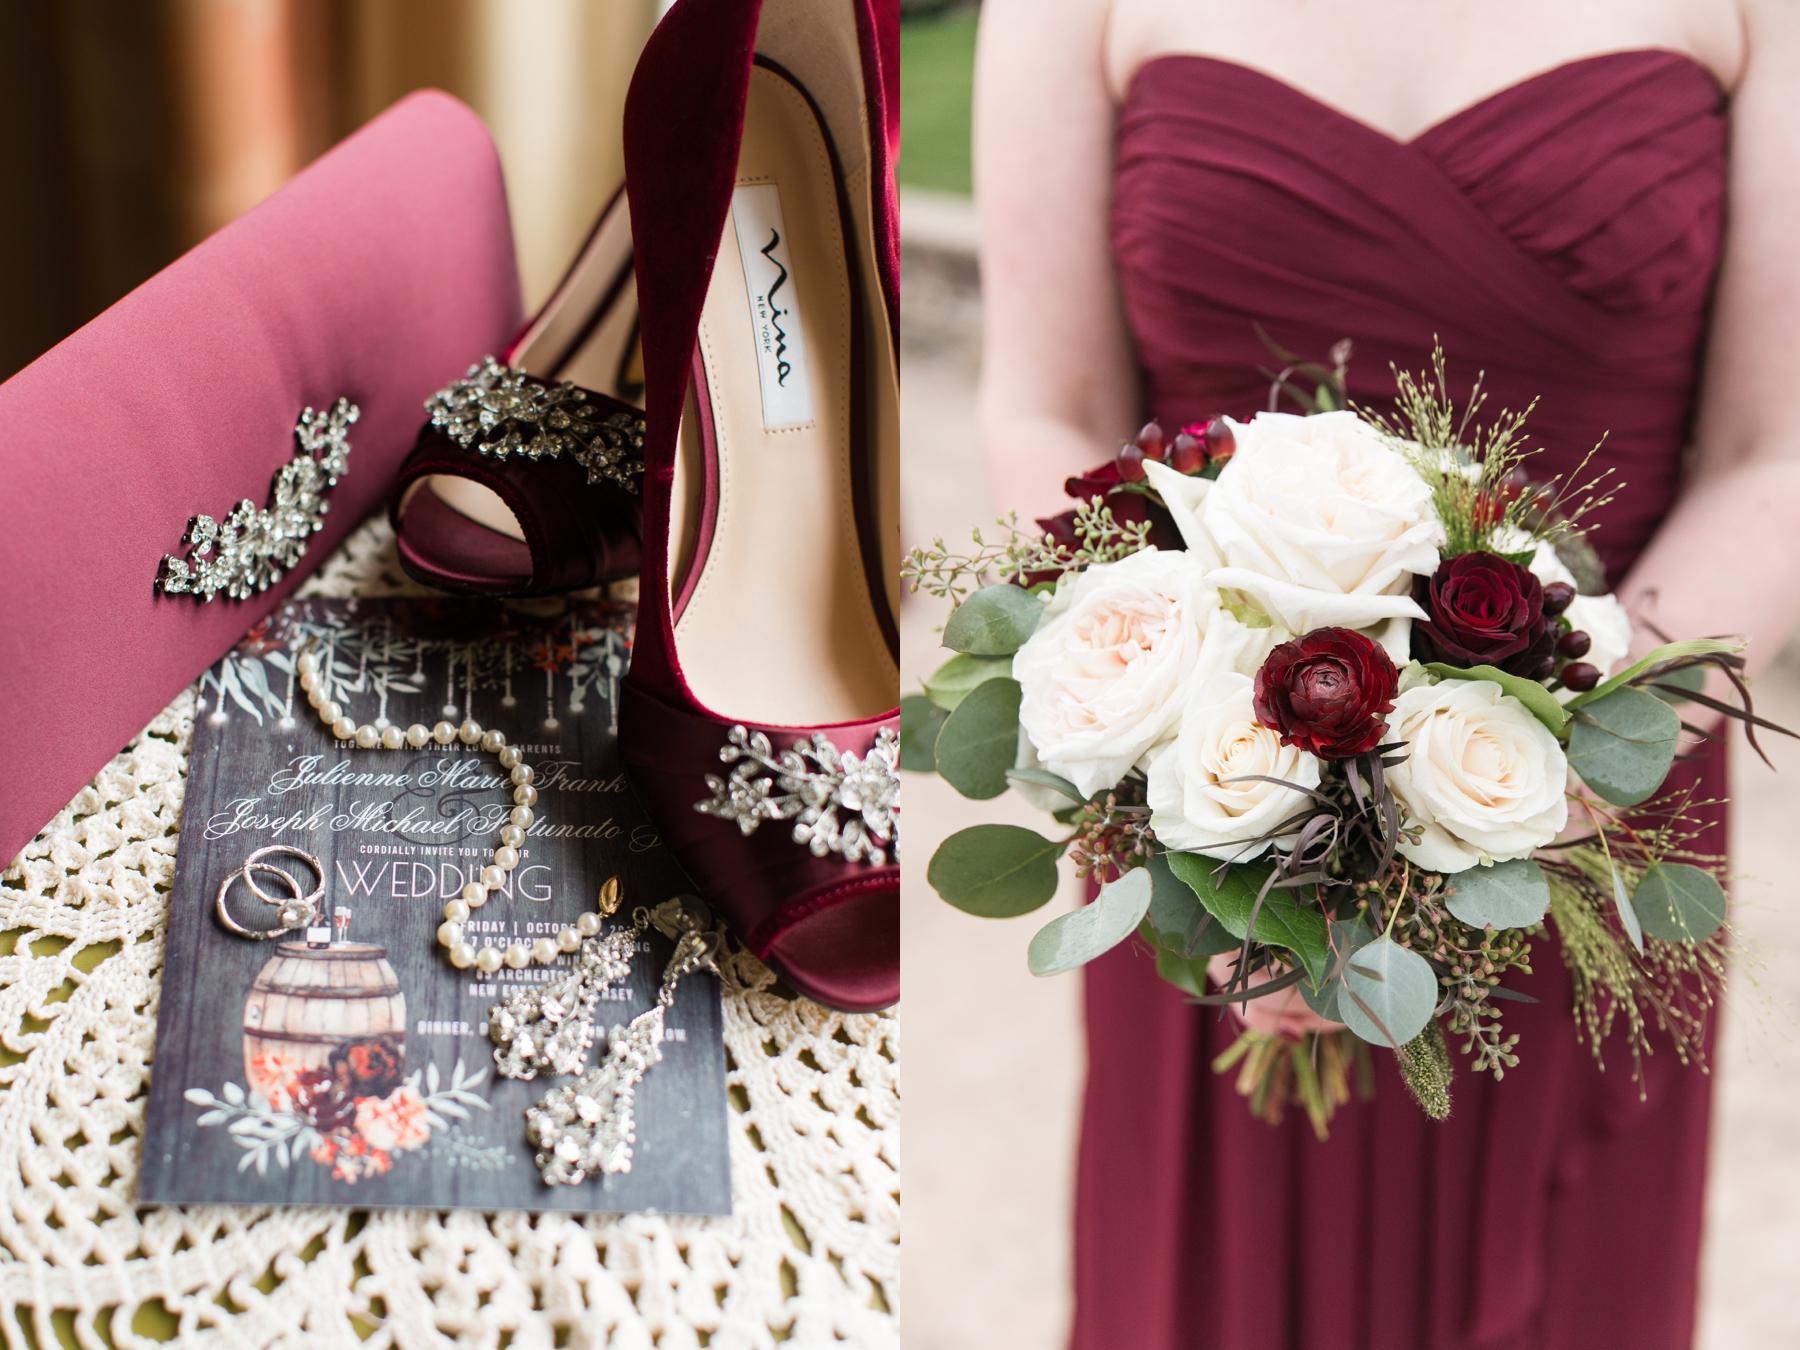 Jules + Joe's Woodsy Wedding at Laurita Winery in New Egypt, NJ